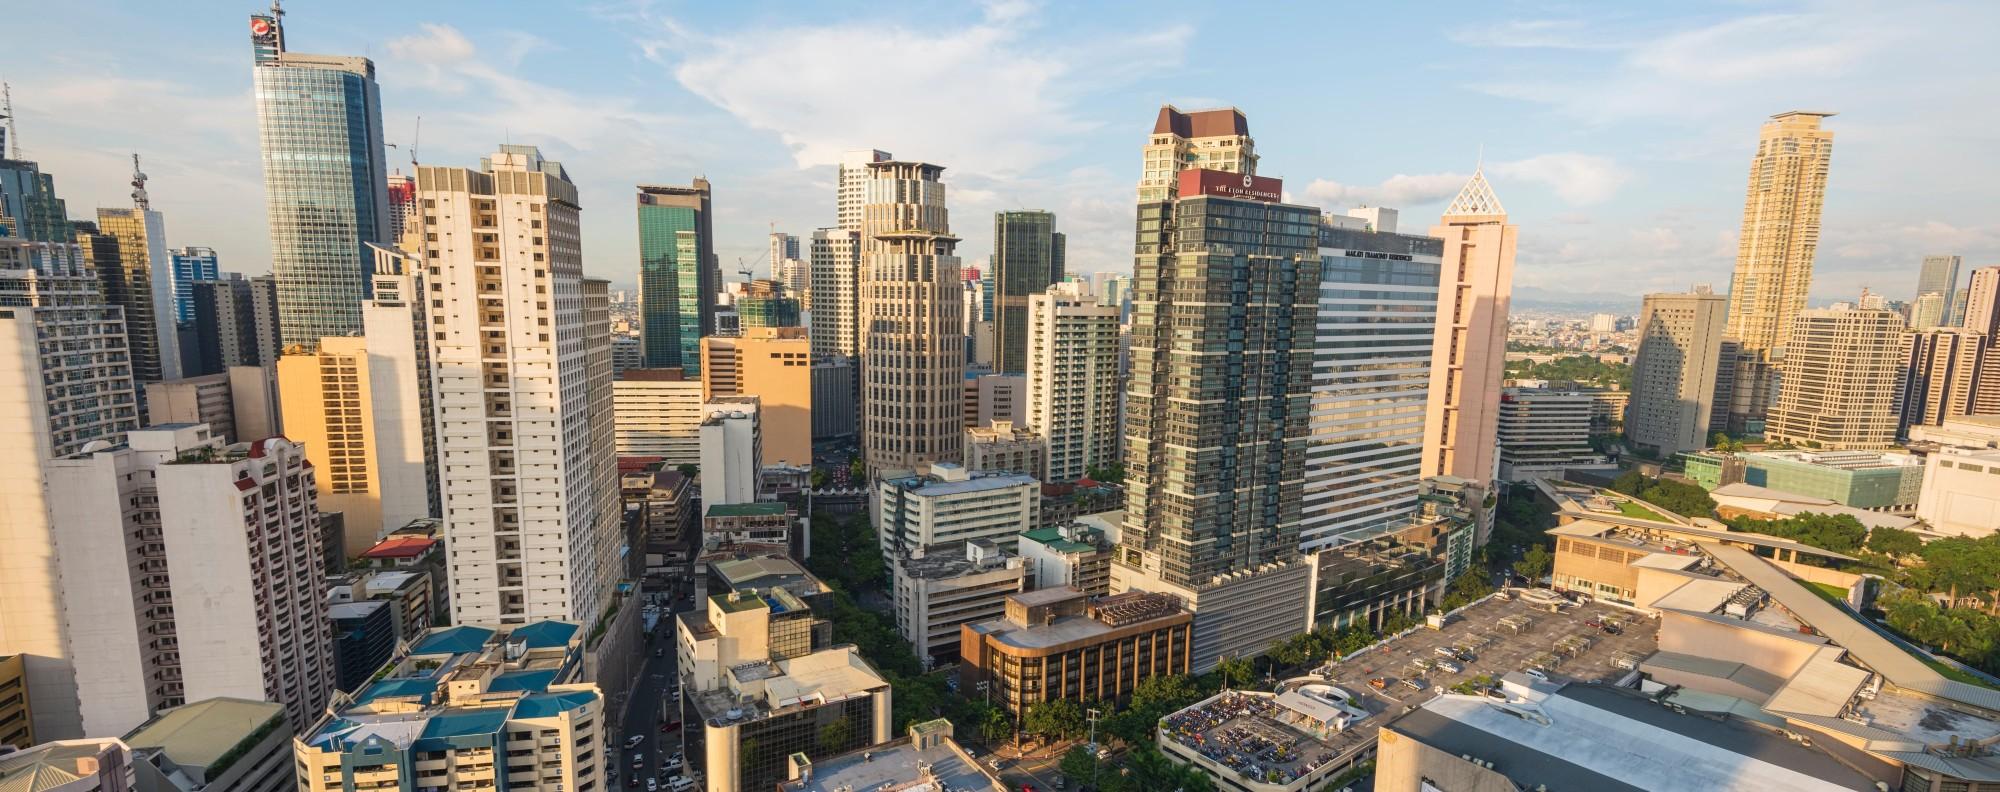 Manila. Photo: Alamy